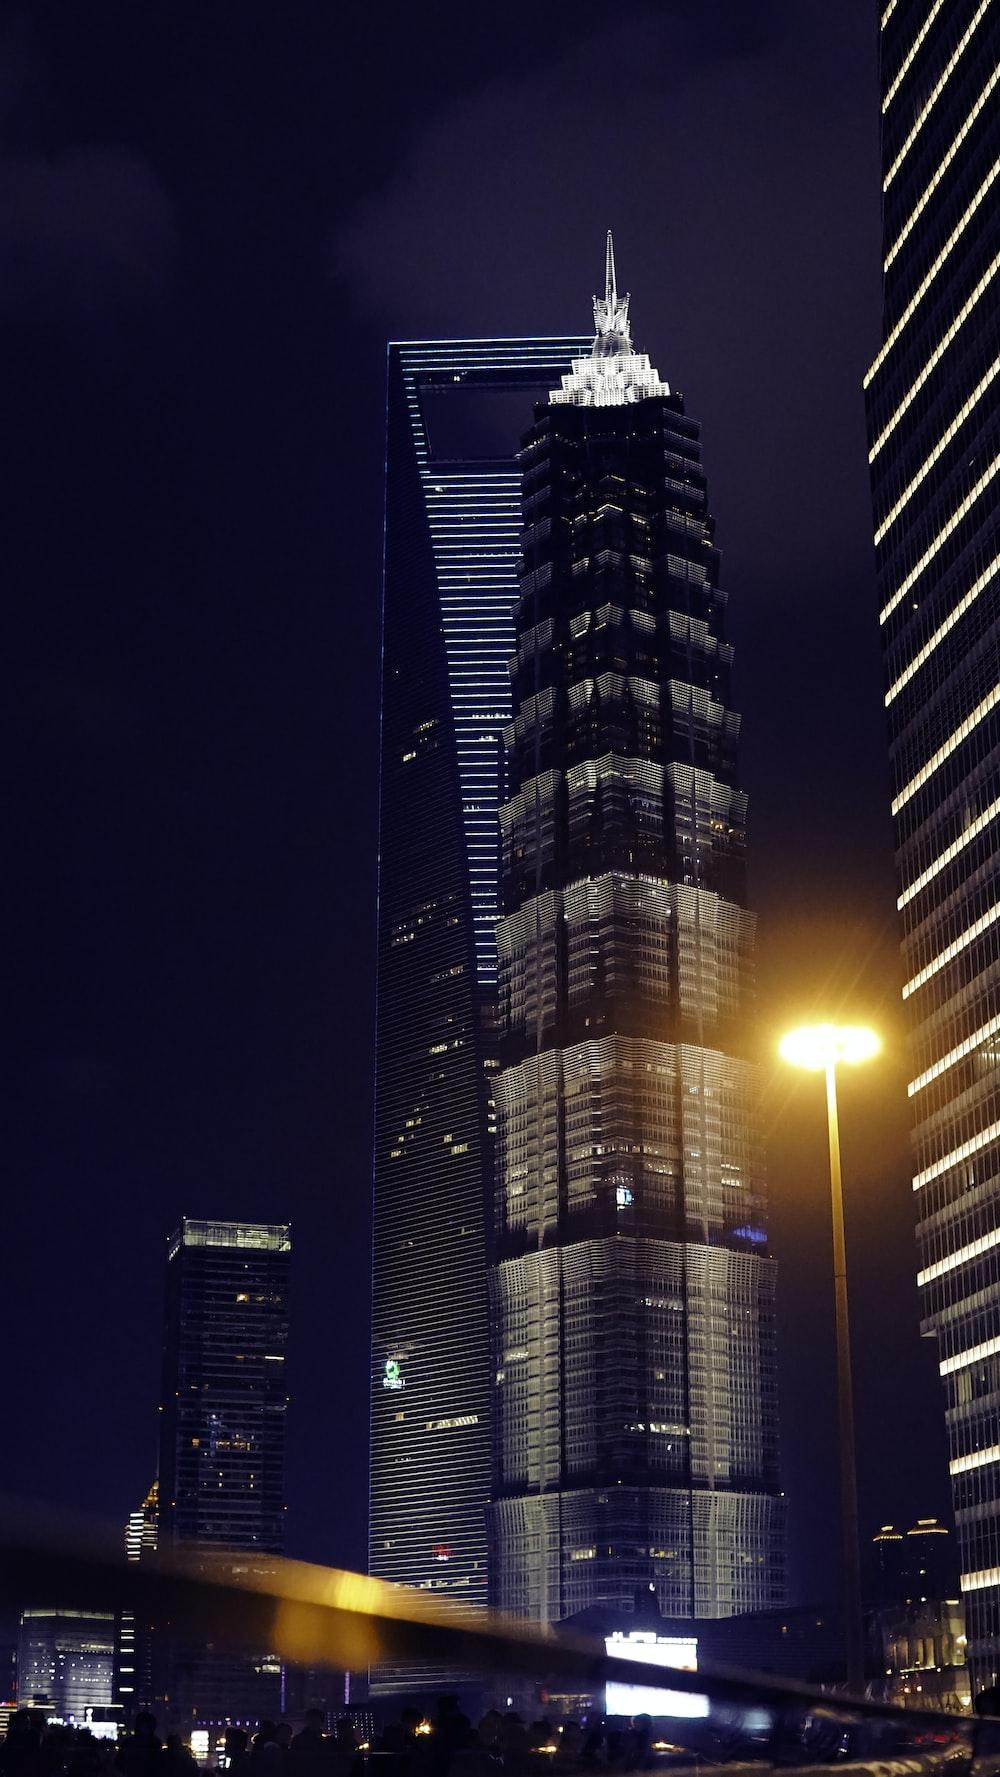 gray curtain buildings at night